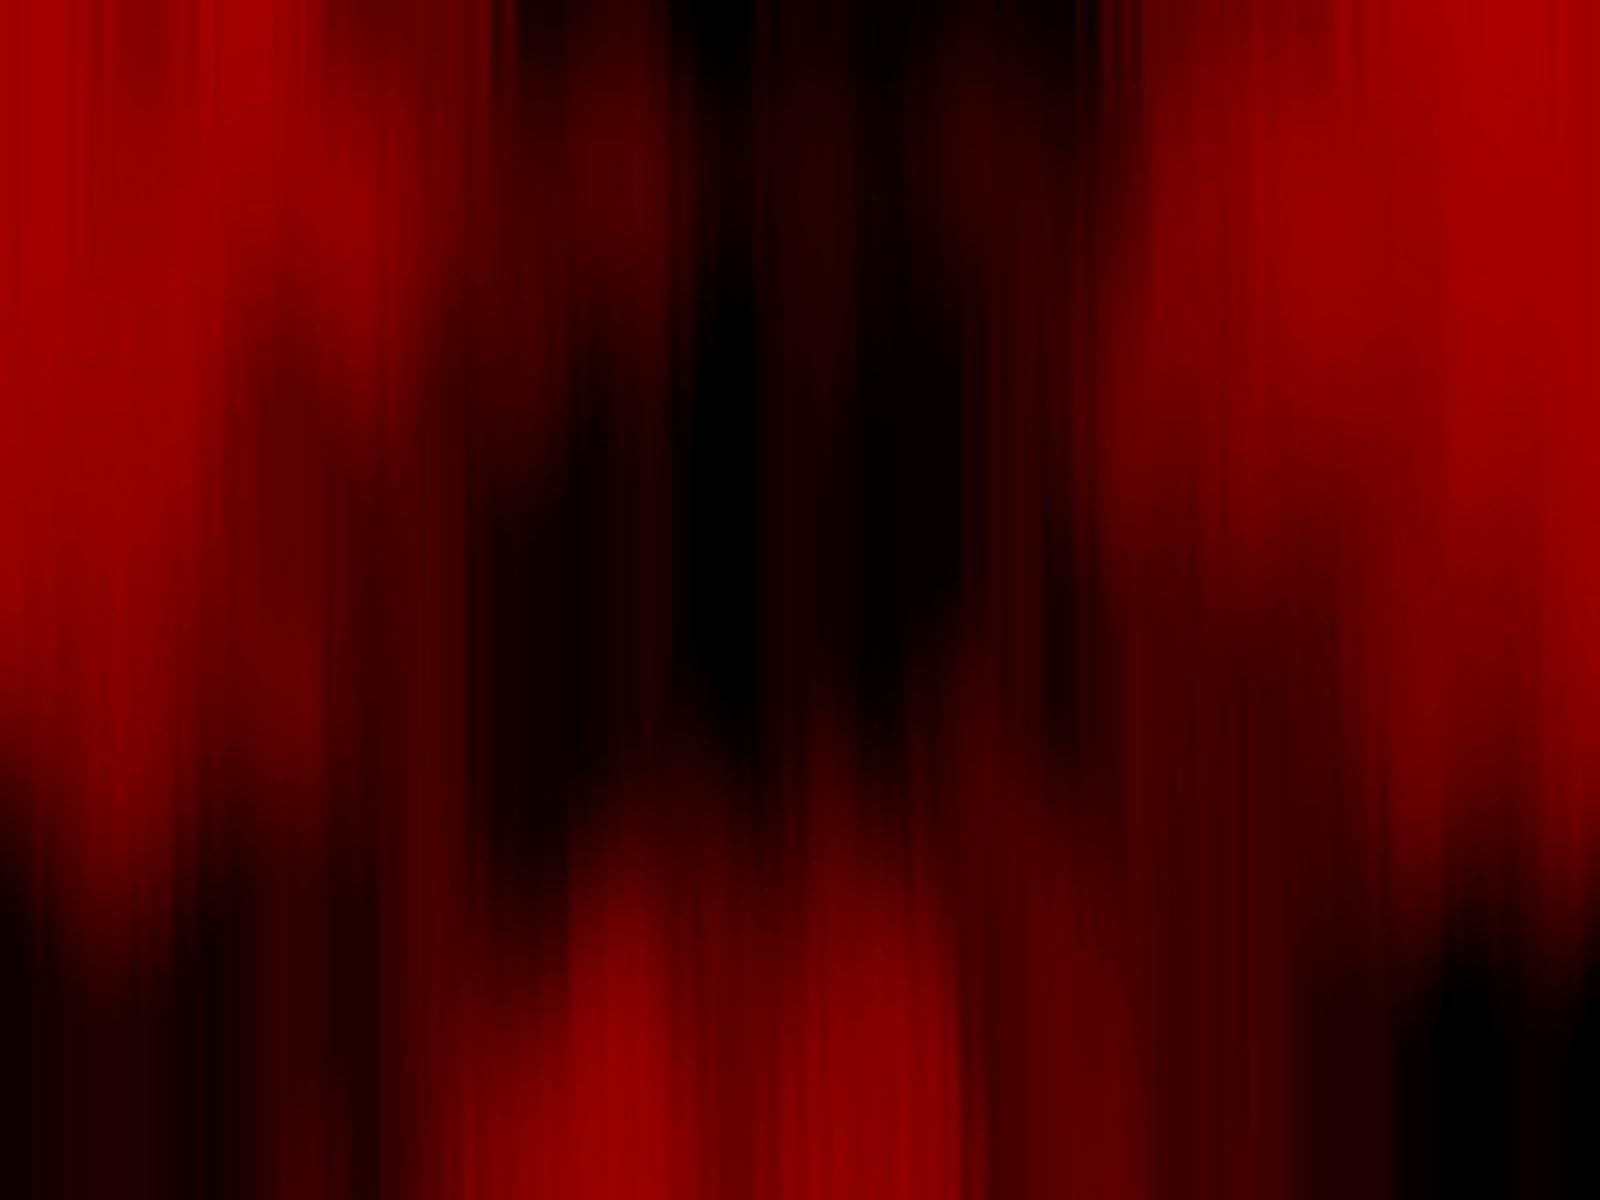 Red And Black Abstract - Red And Black Abstract